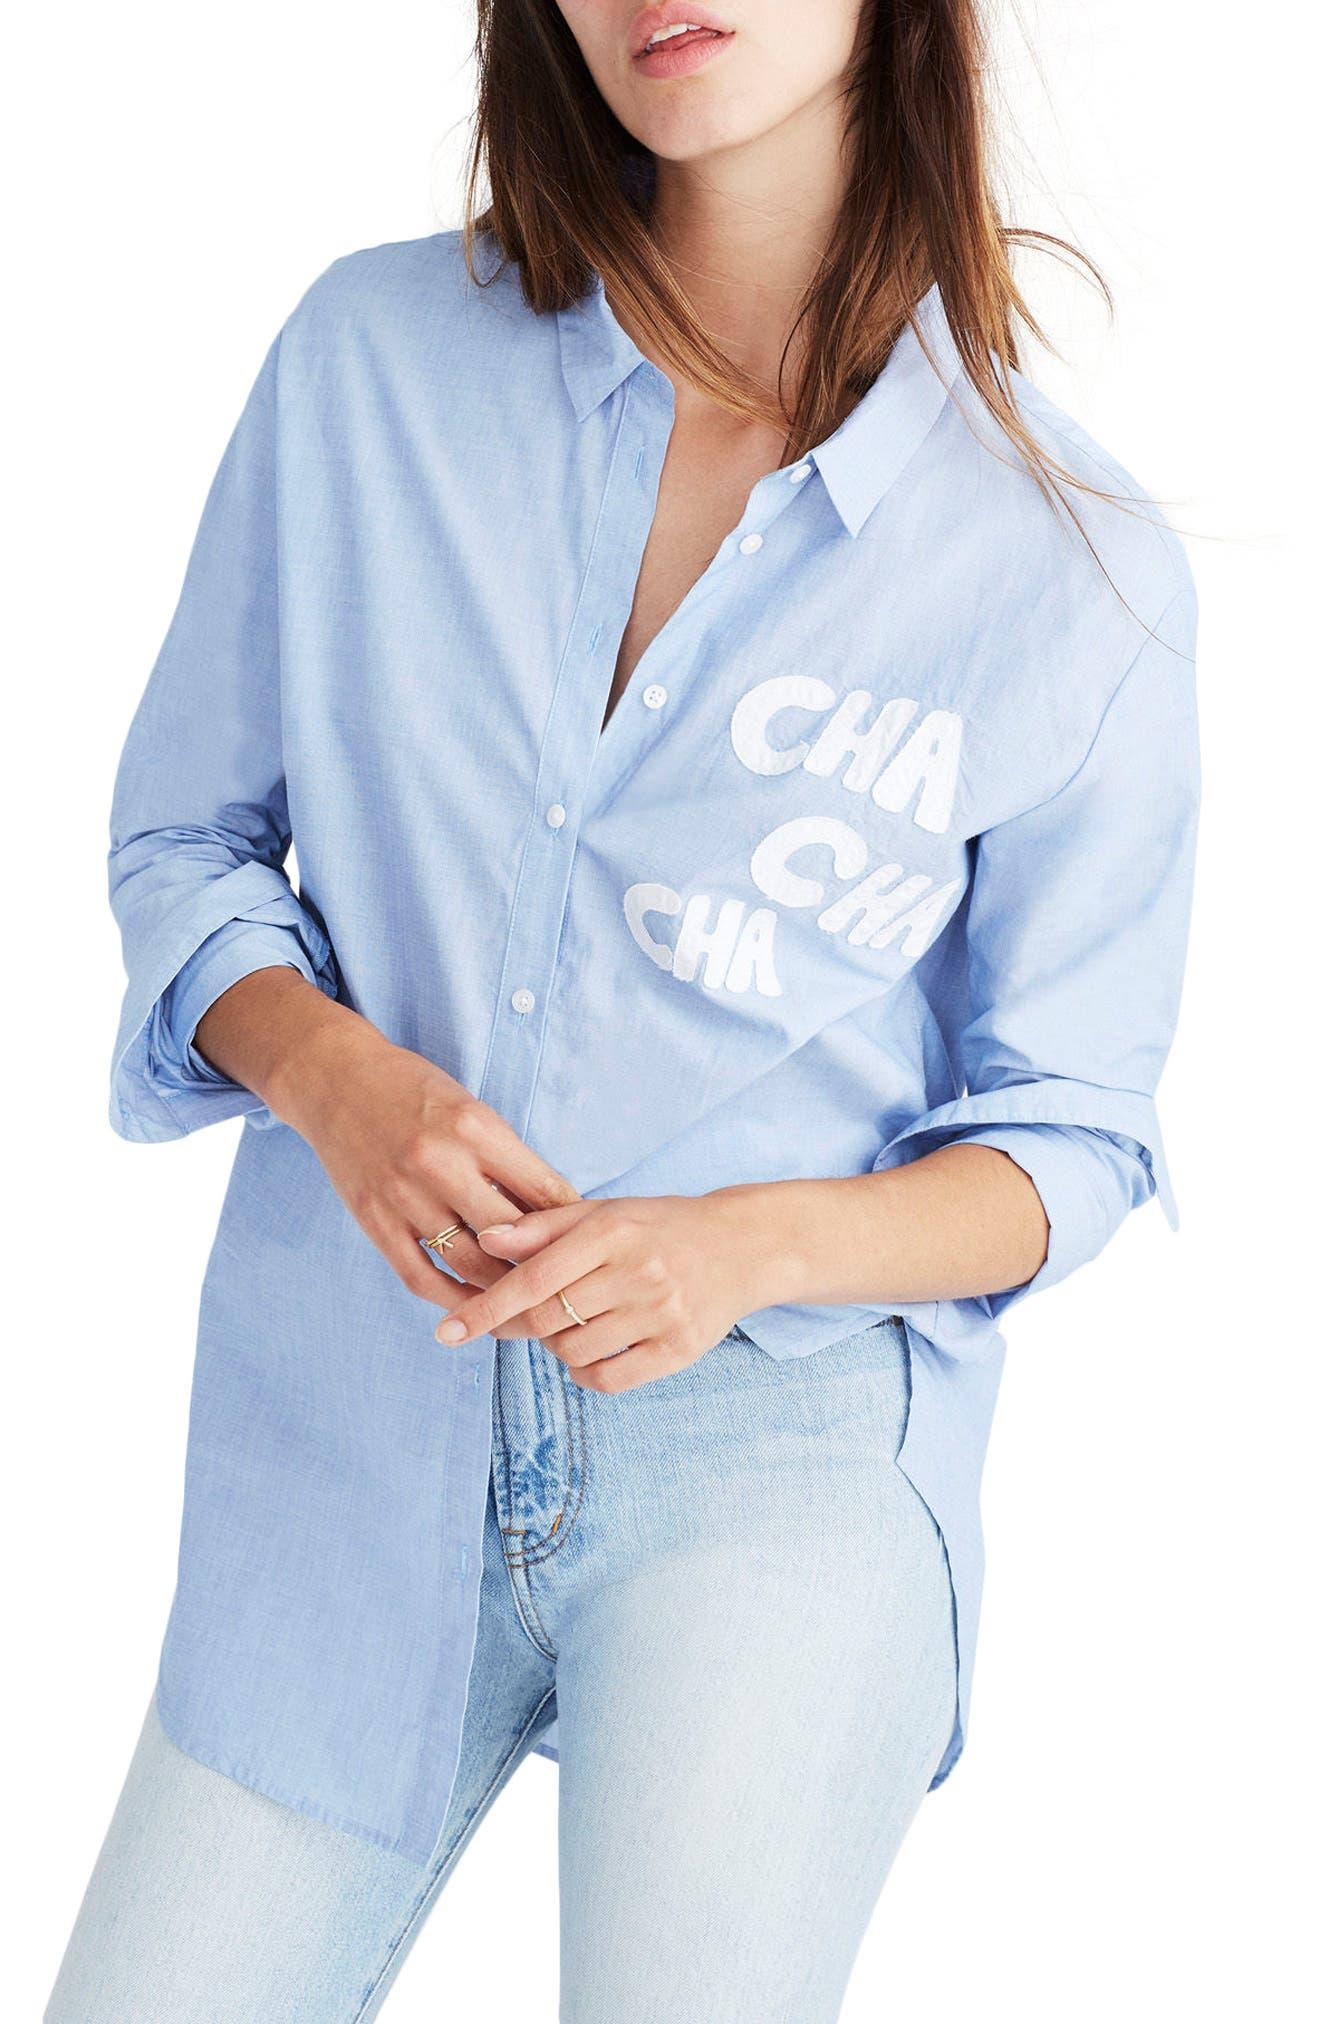 Cha Cha Cha Ex-Boyfriend Shirt,                         Main,                         color, Soft Twilight